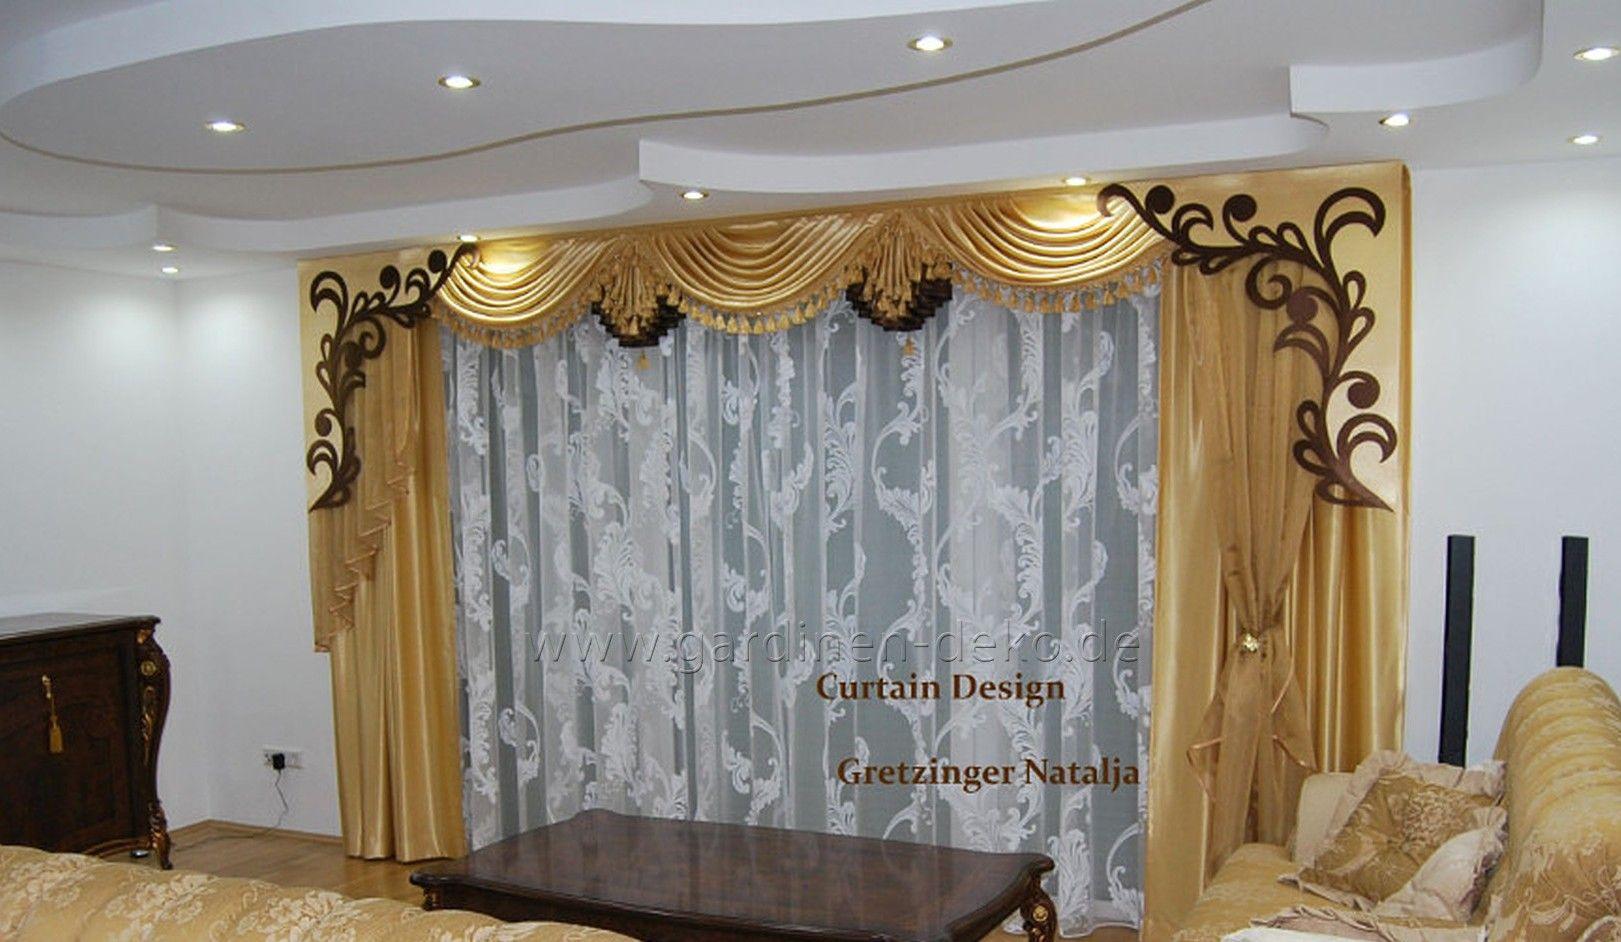 Edler klassischer Vorhang in dunklem Champagnerton - http://www.gardinen-deko.de/edler-klassischer-vorhang-dunklem-champagnerton/